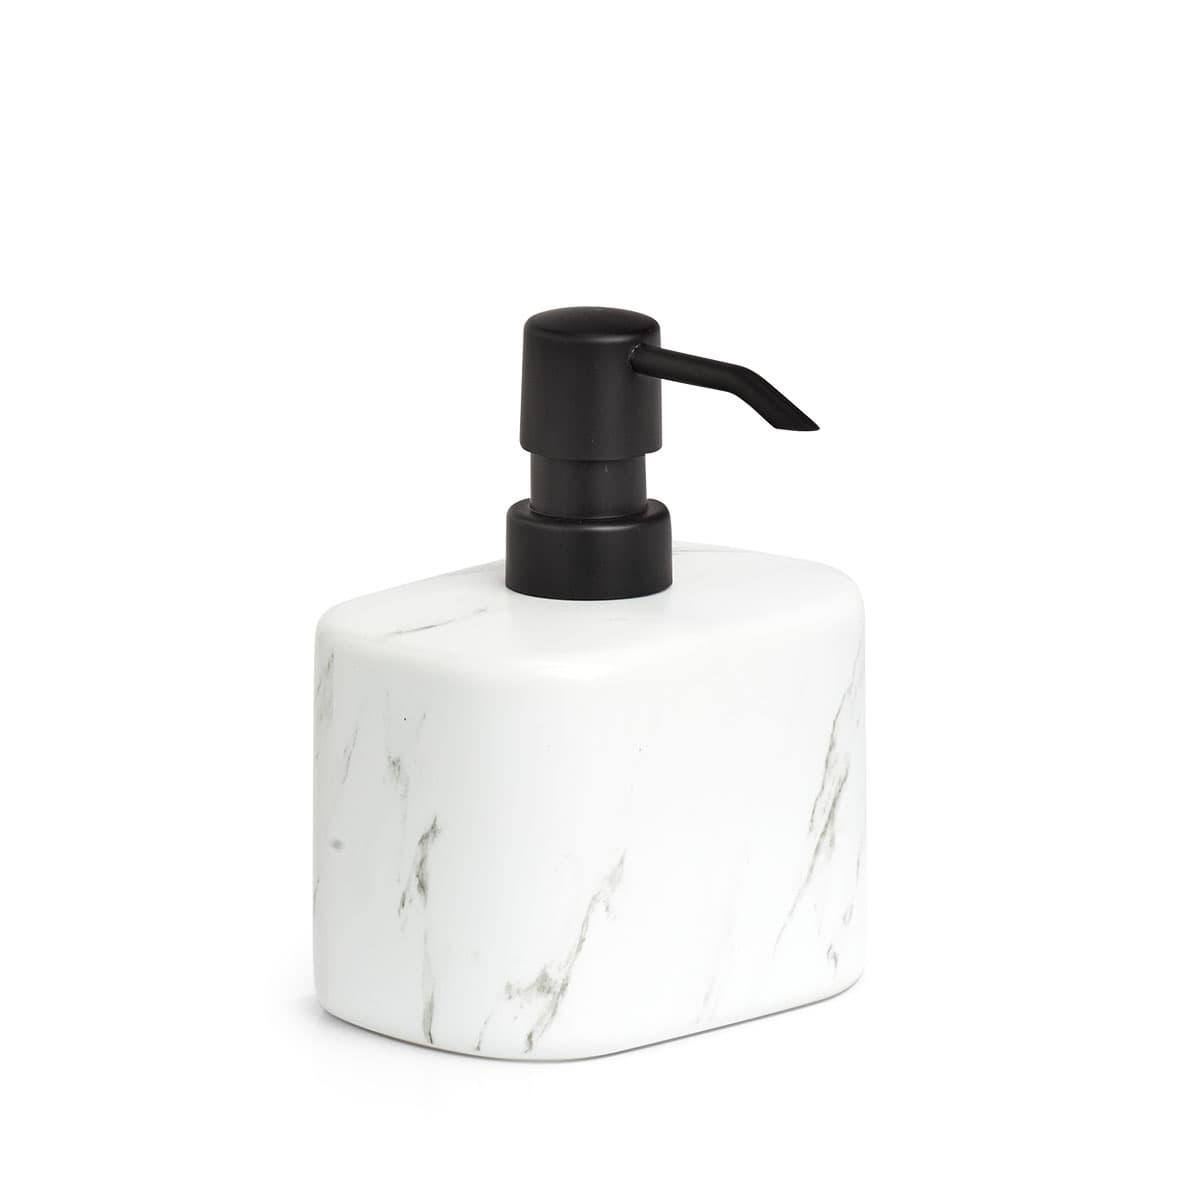 Dozator pentru sapun din ceramica, Marble Alb / Negru, L11xl8,1xH13,2 cm somproduct.ro